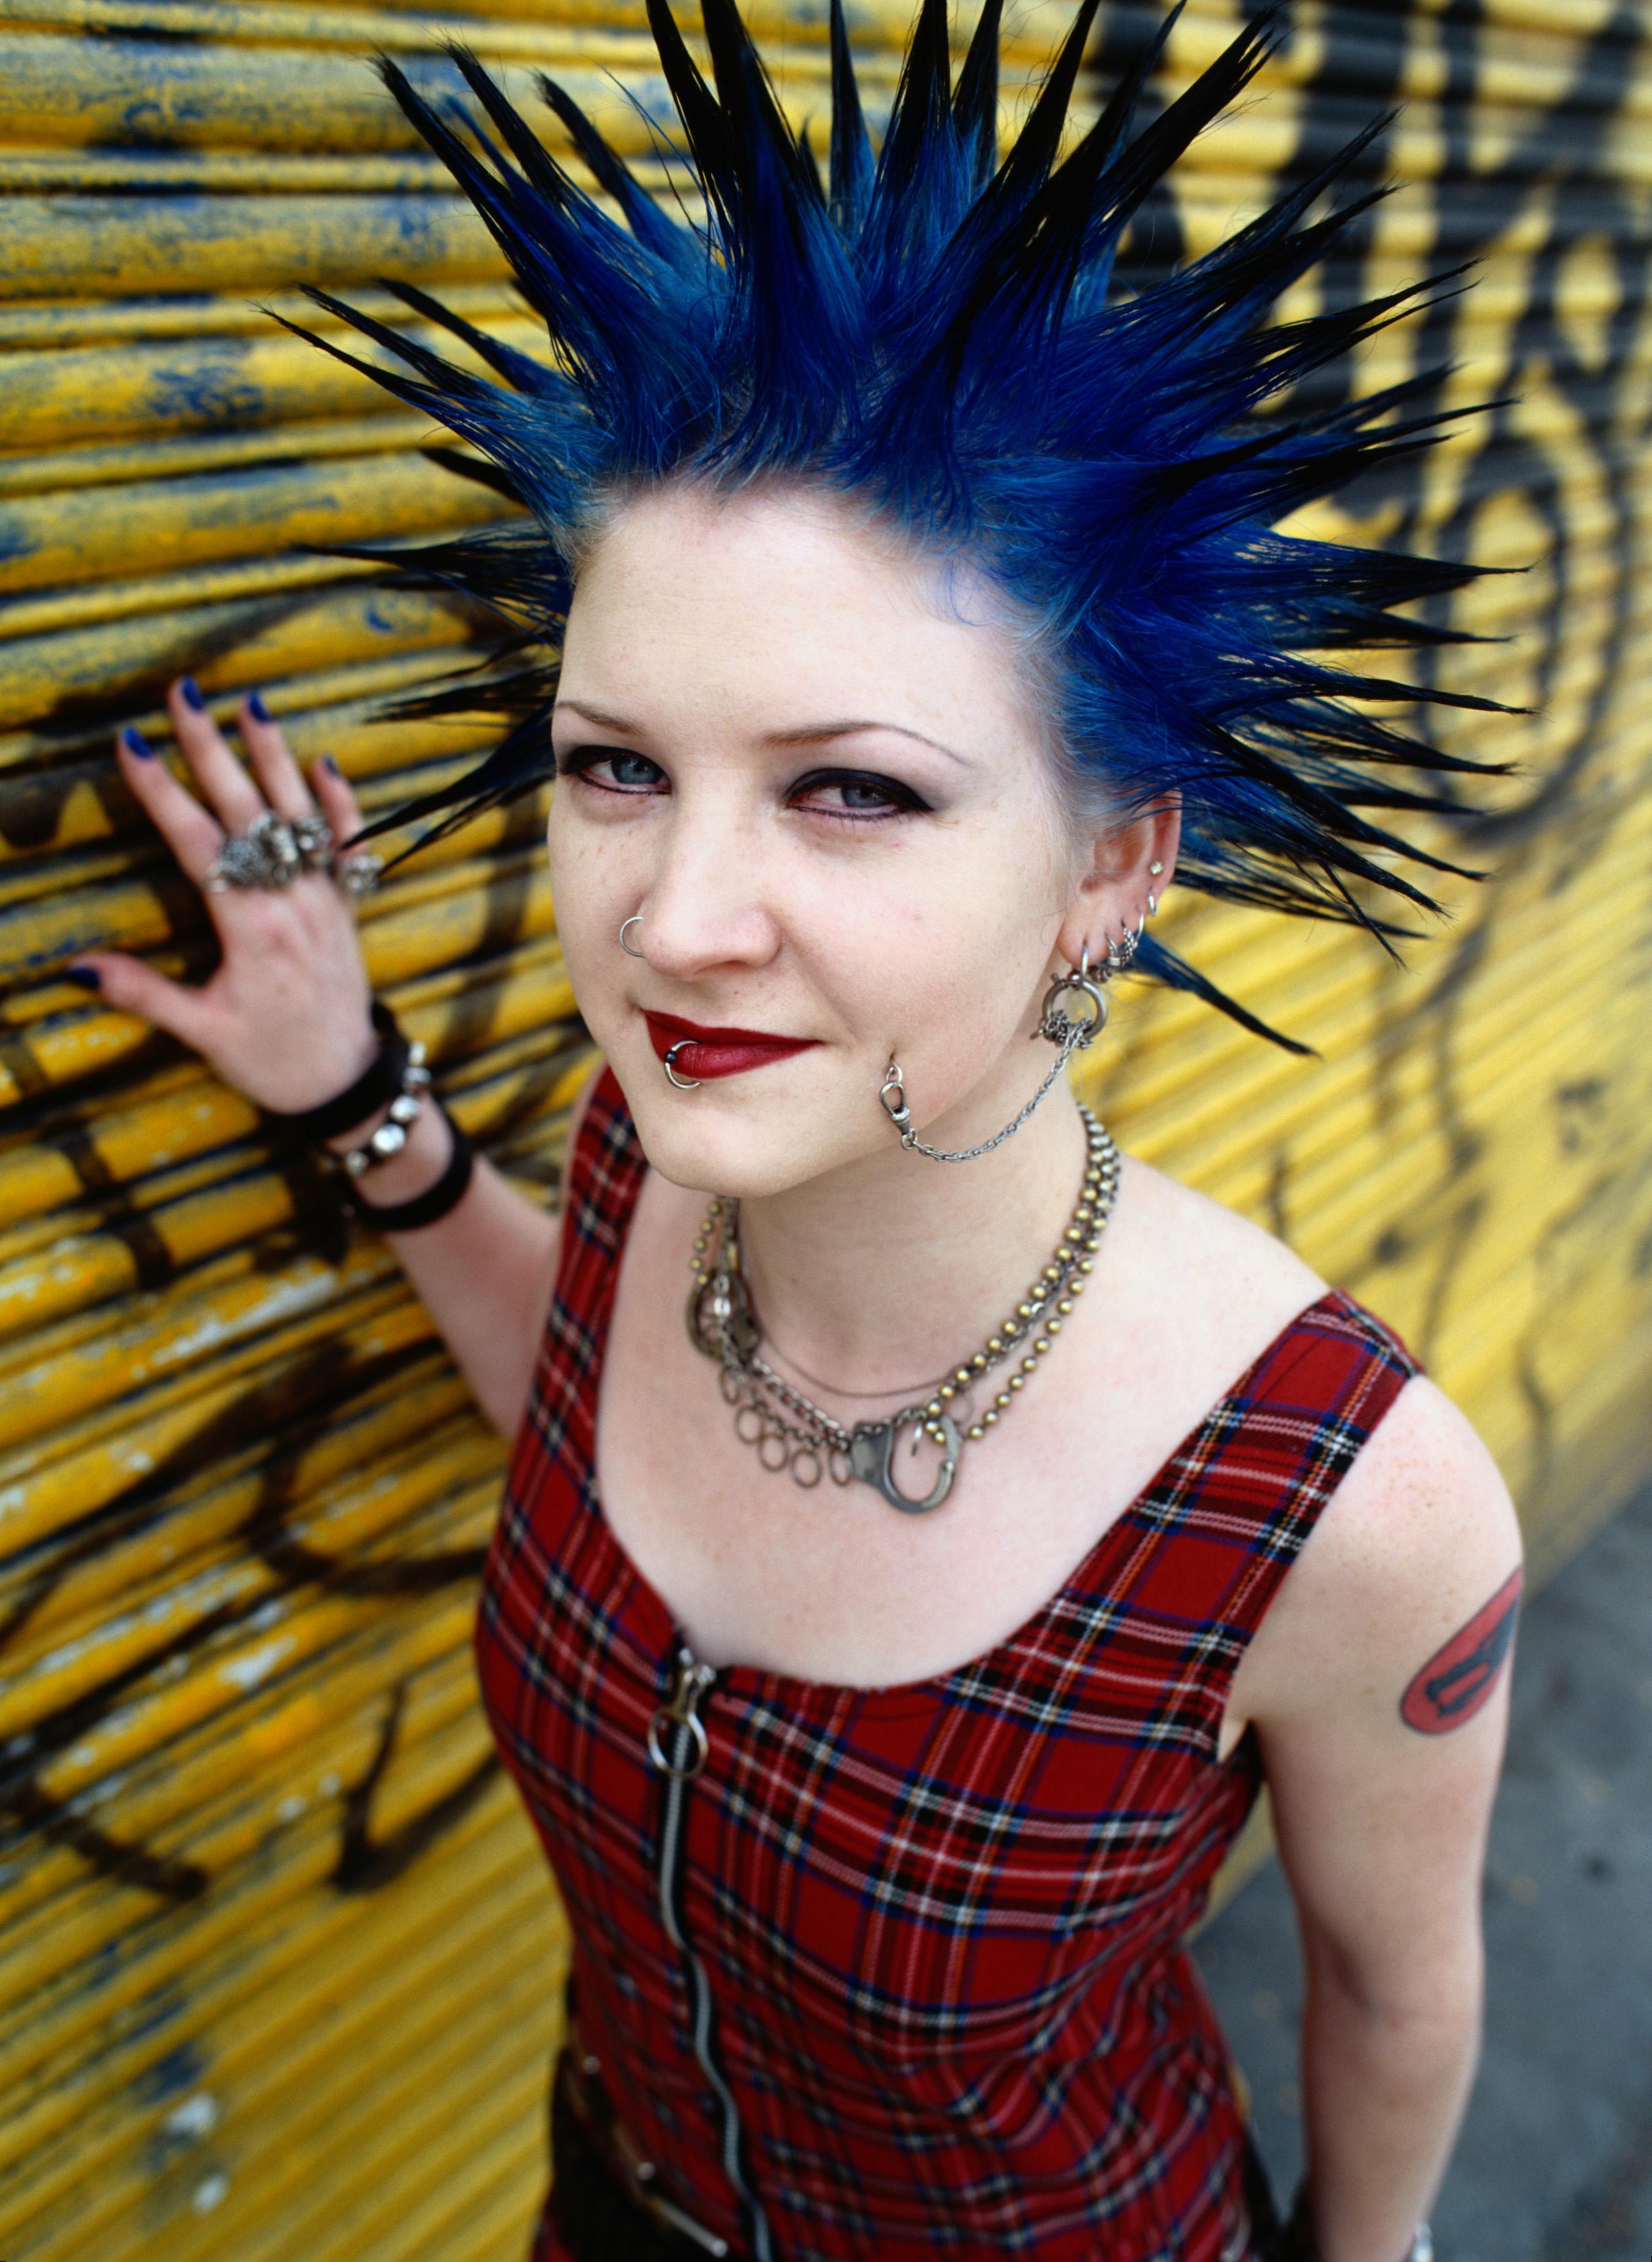 Conocer chicos punk [PUNIQRANDLINE-(au-dating-names.txt) 60